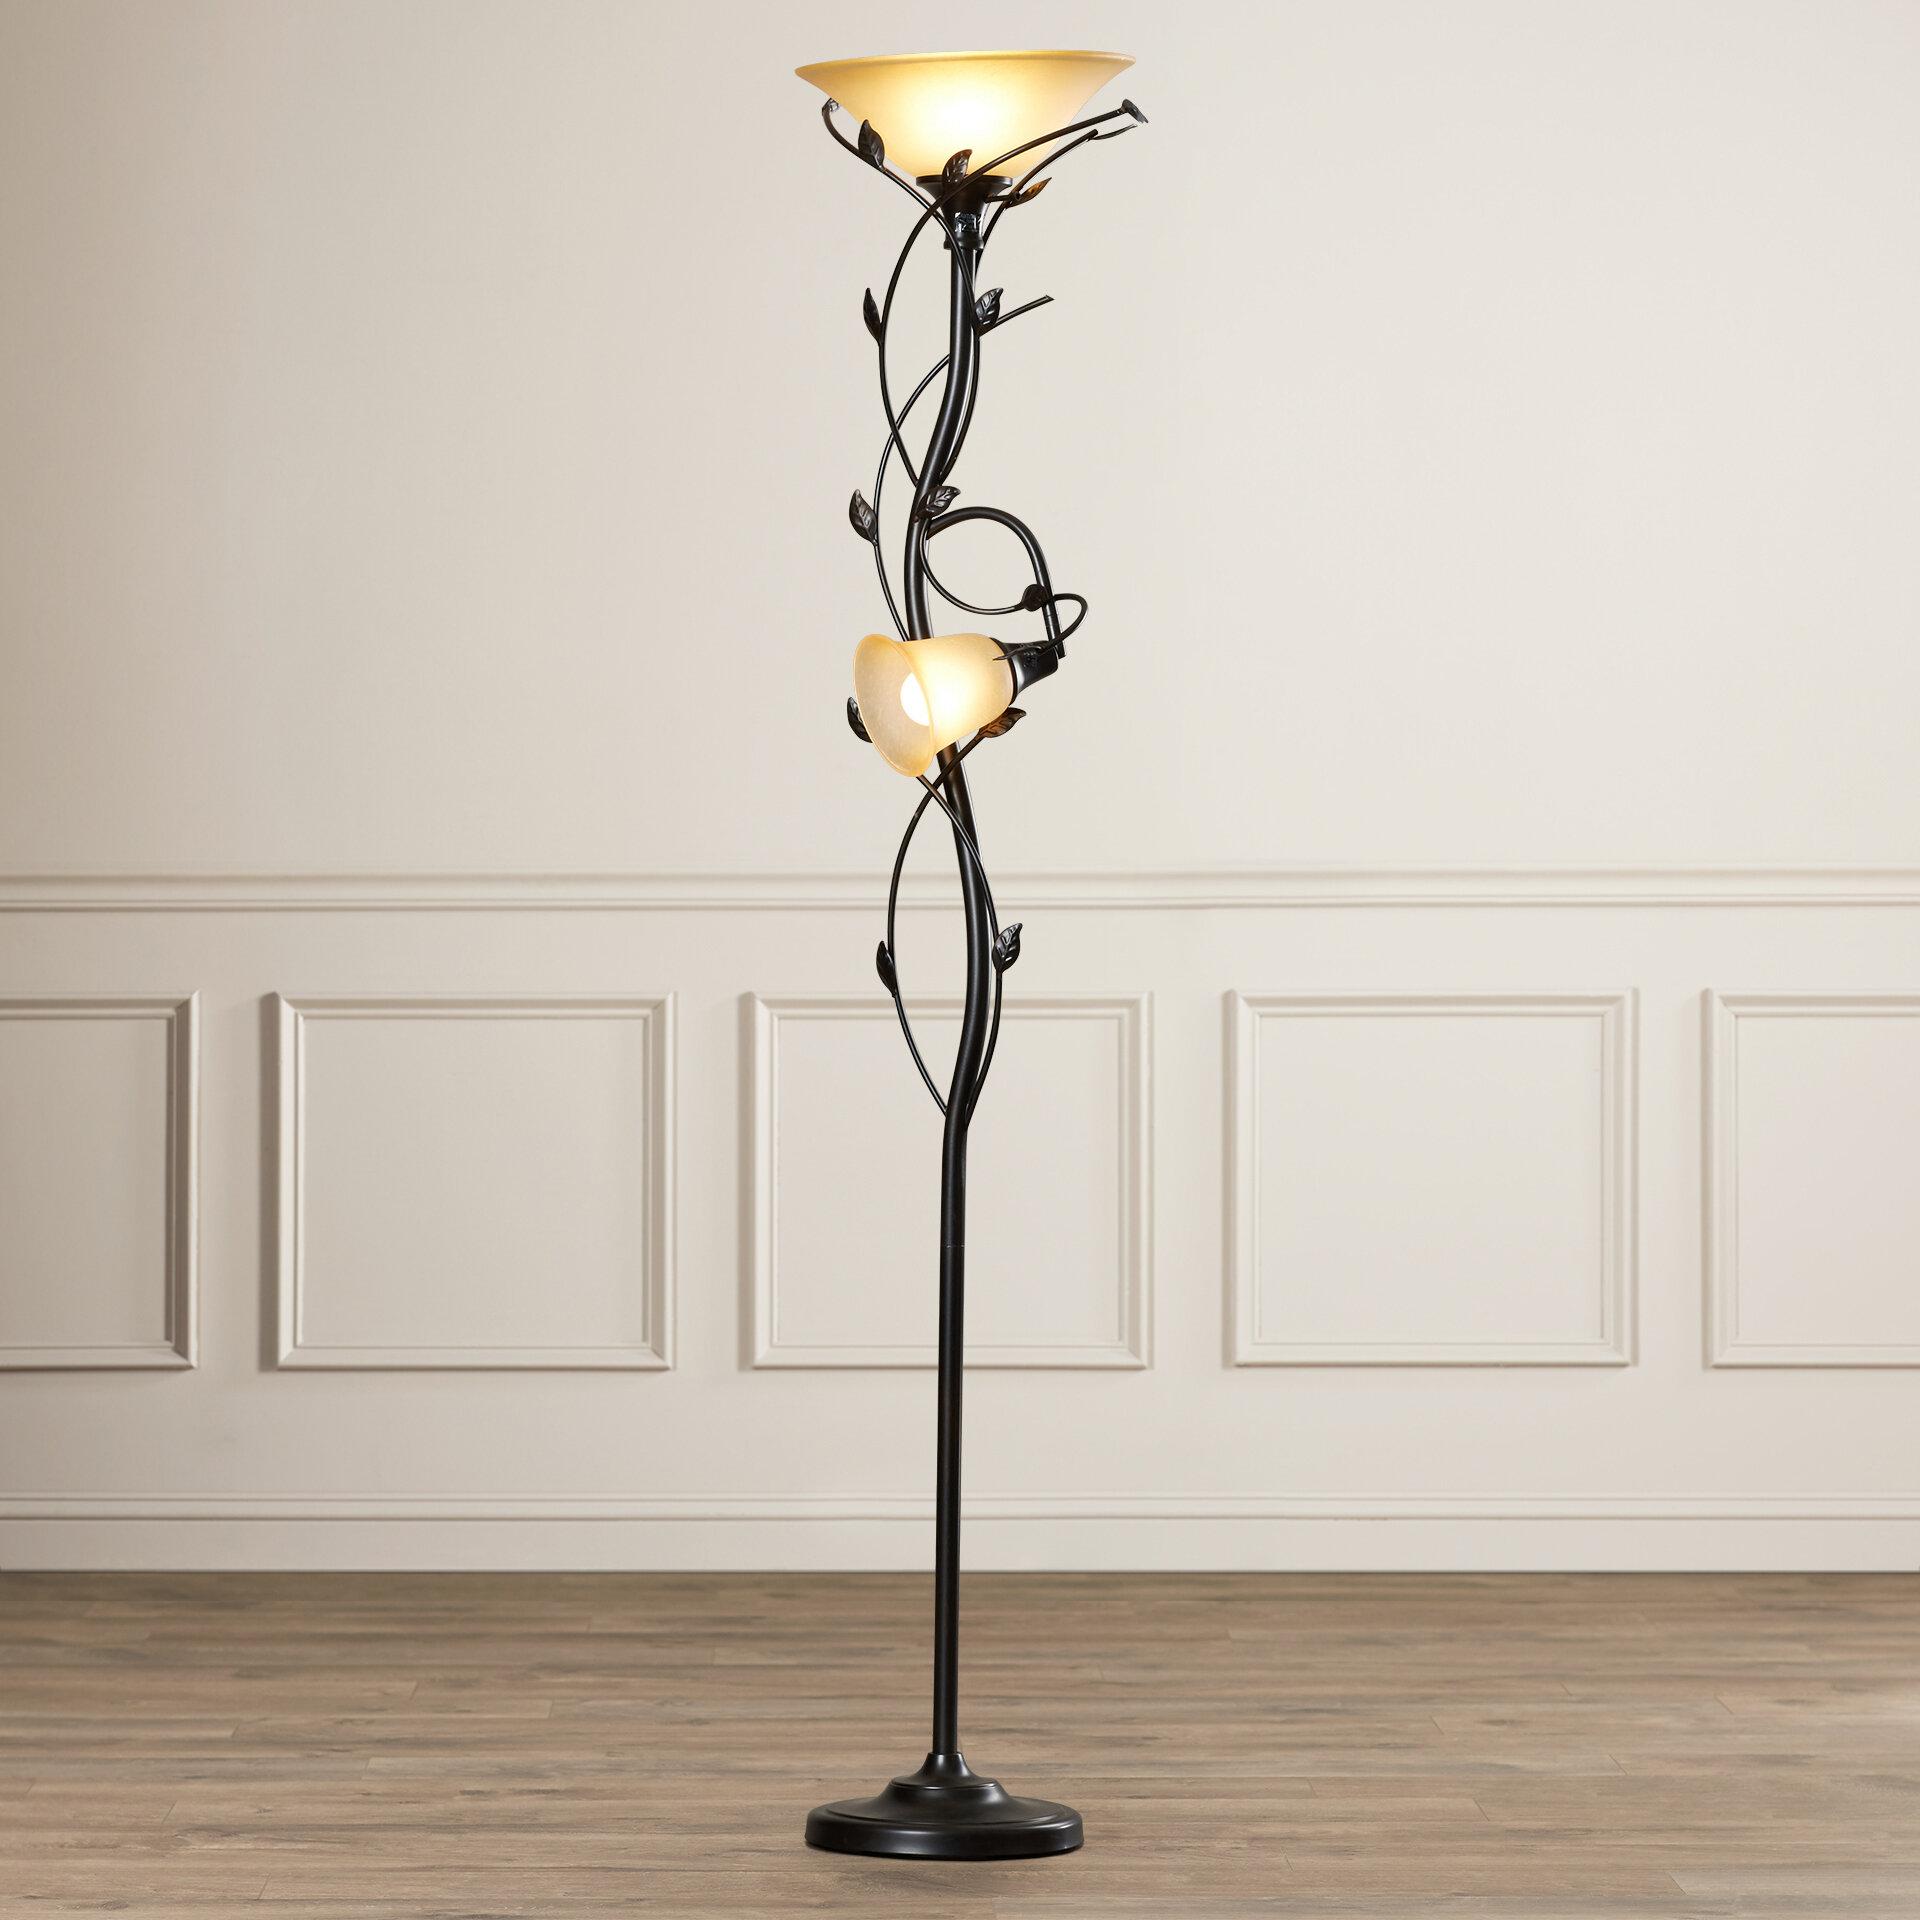 Ila 72 Torchiere Floor Lamp Reviews